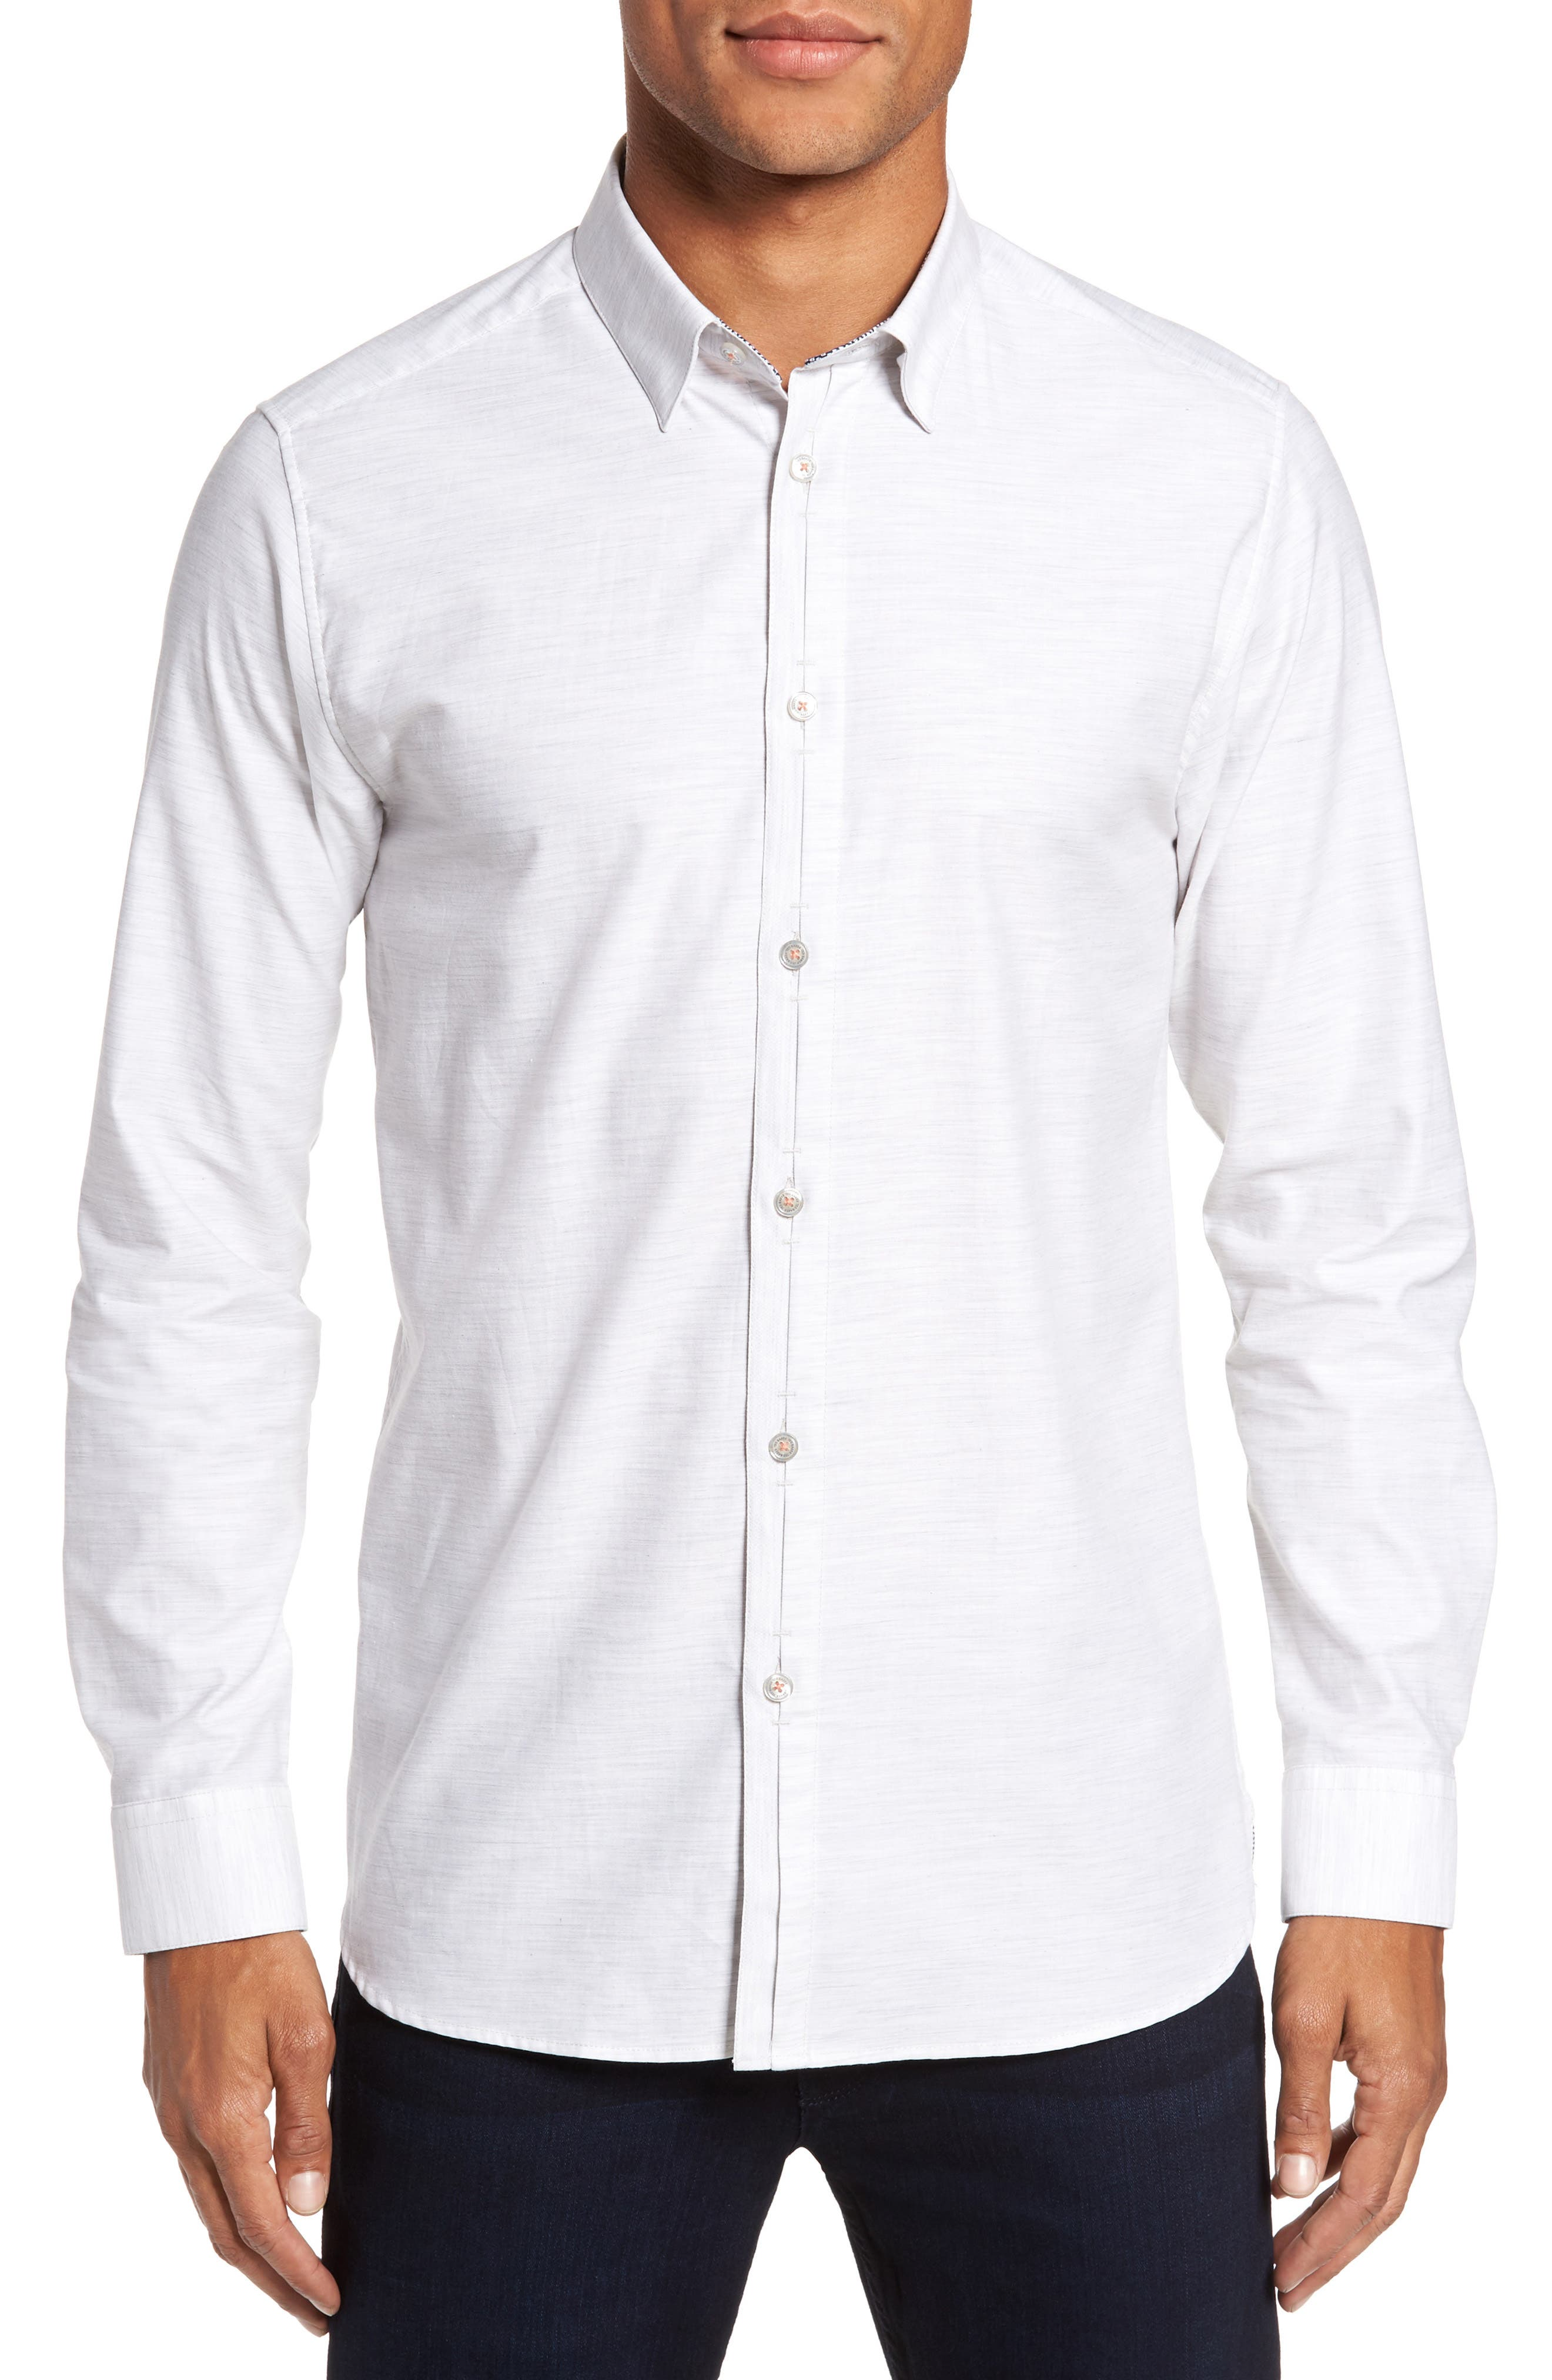 Annisley Modern Slim Fit Sport Shirt,                             Main thumbnail 1, color,                             031